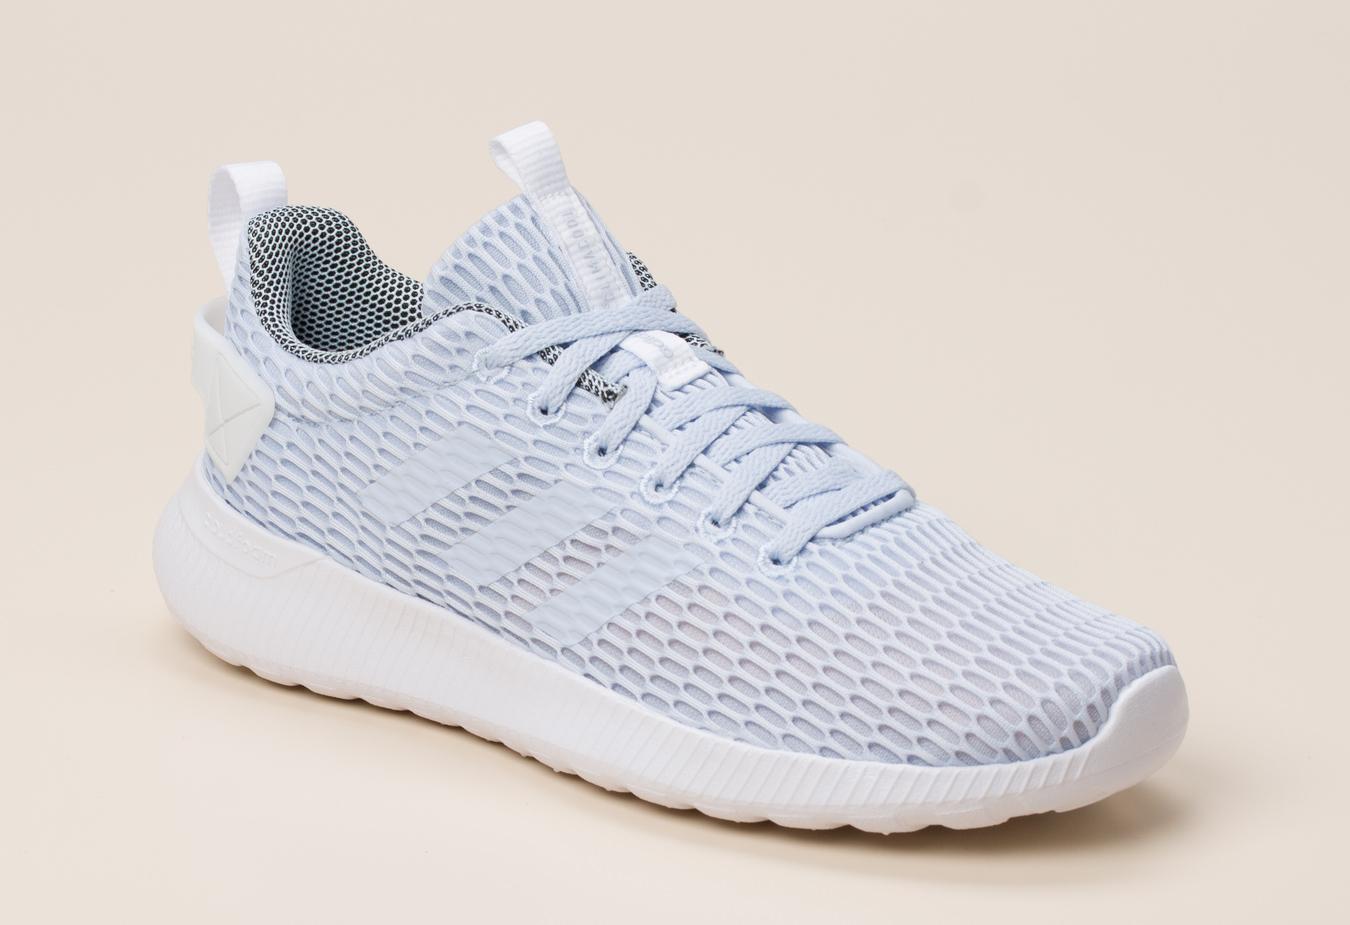 Adidas Damen Sneaker in hellblau kaufen | Zumnorde Online Shop